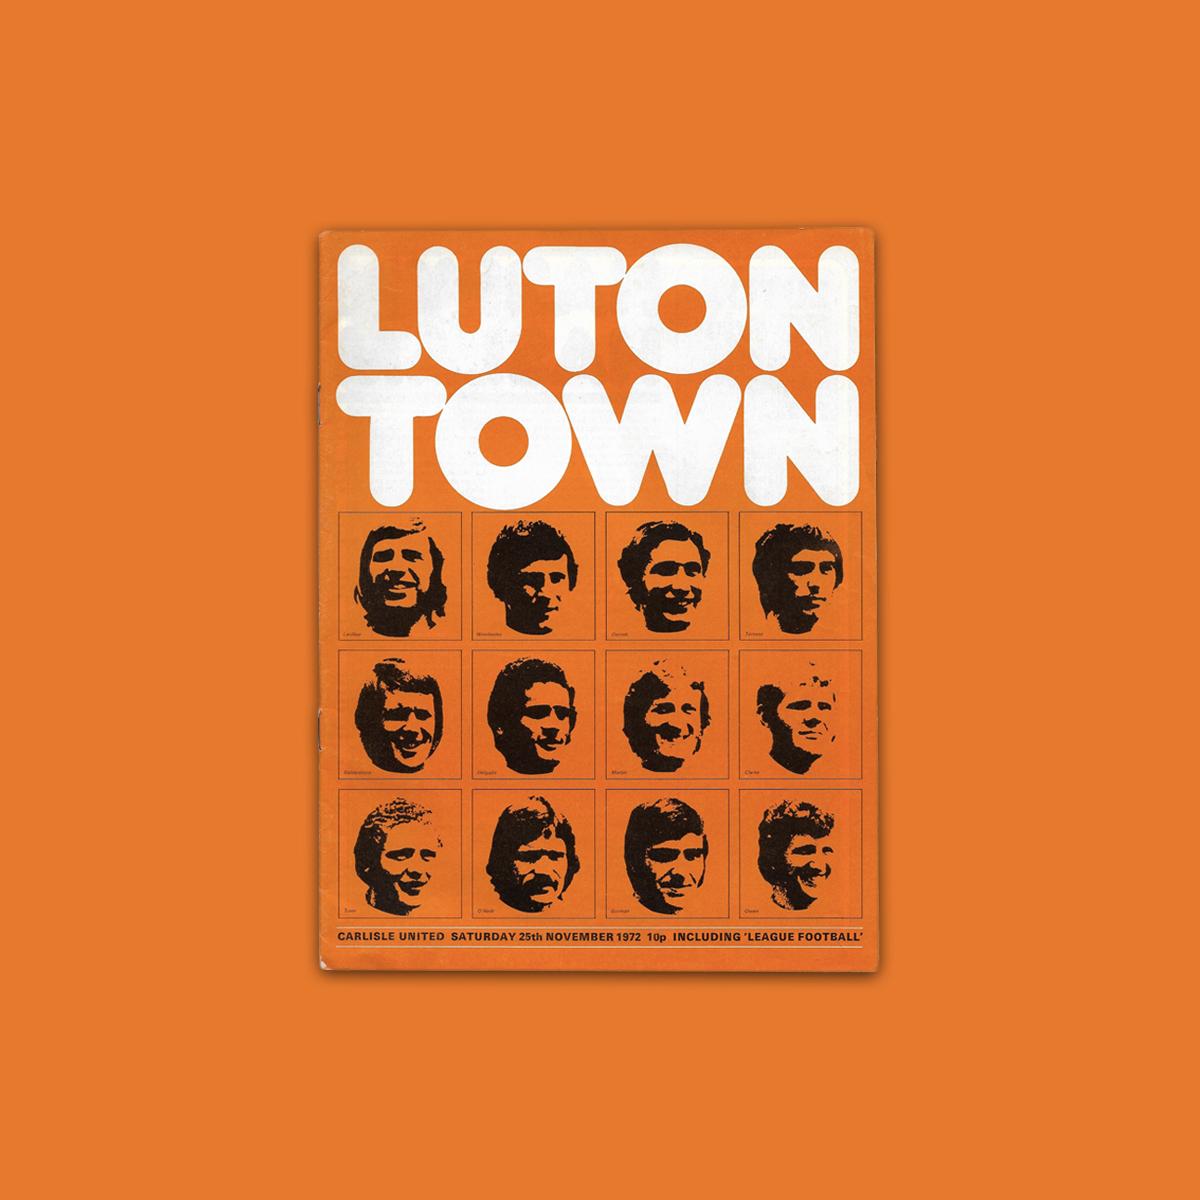 11_25_1972_Luton_Carlisle_Front